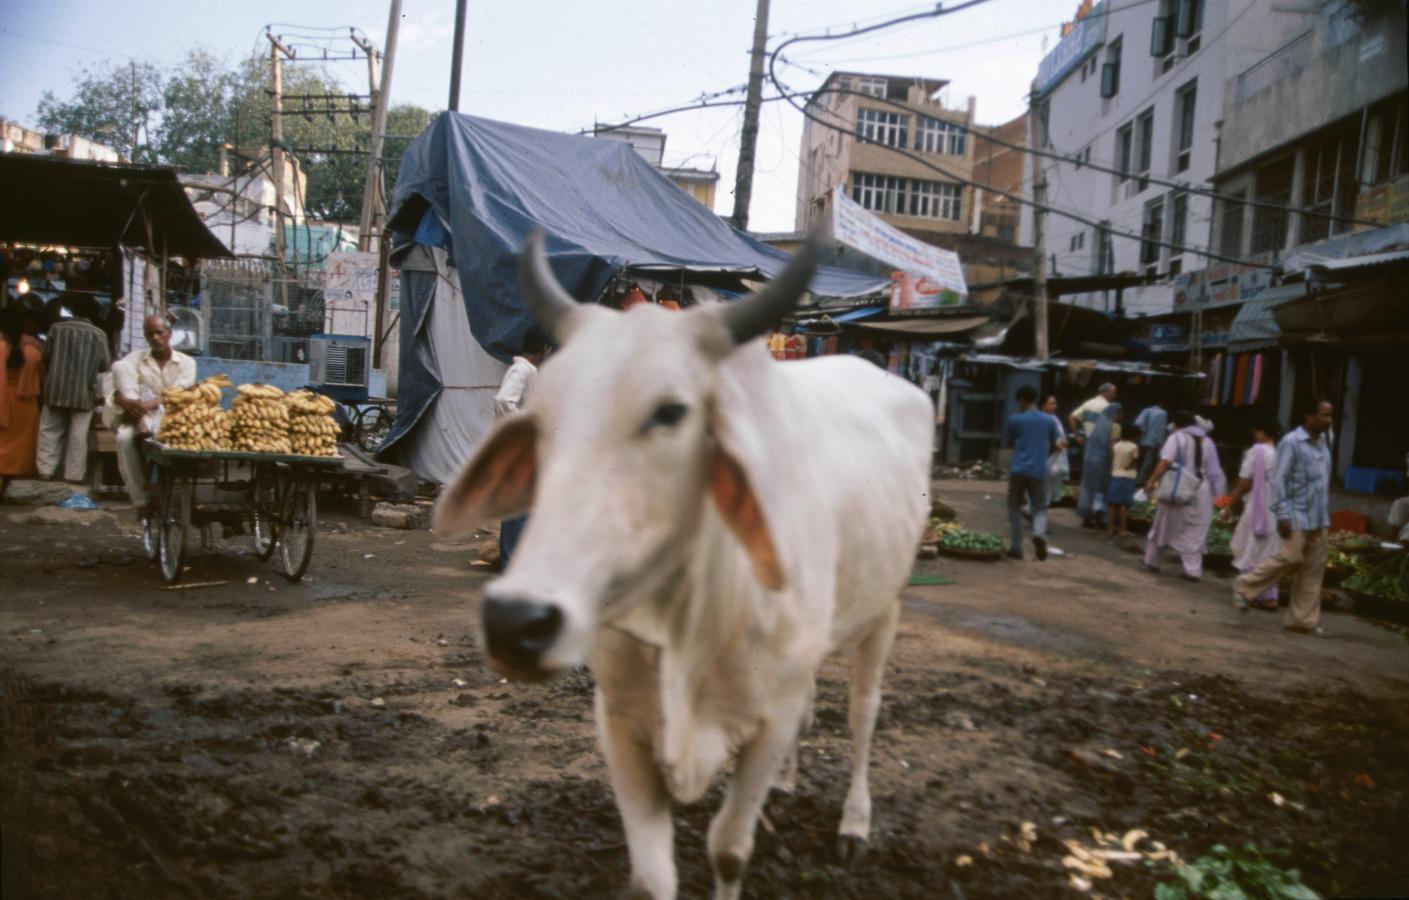 cow-in-the-street-delhi-2003